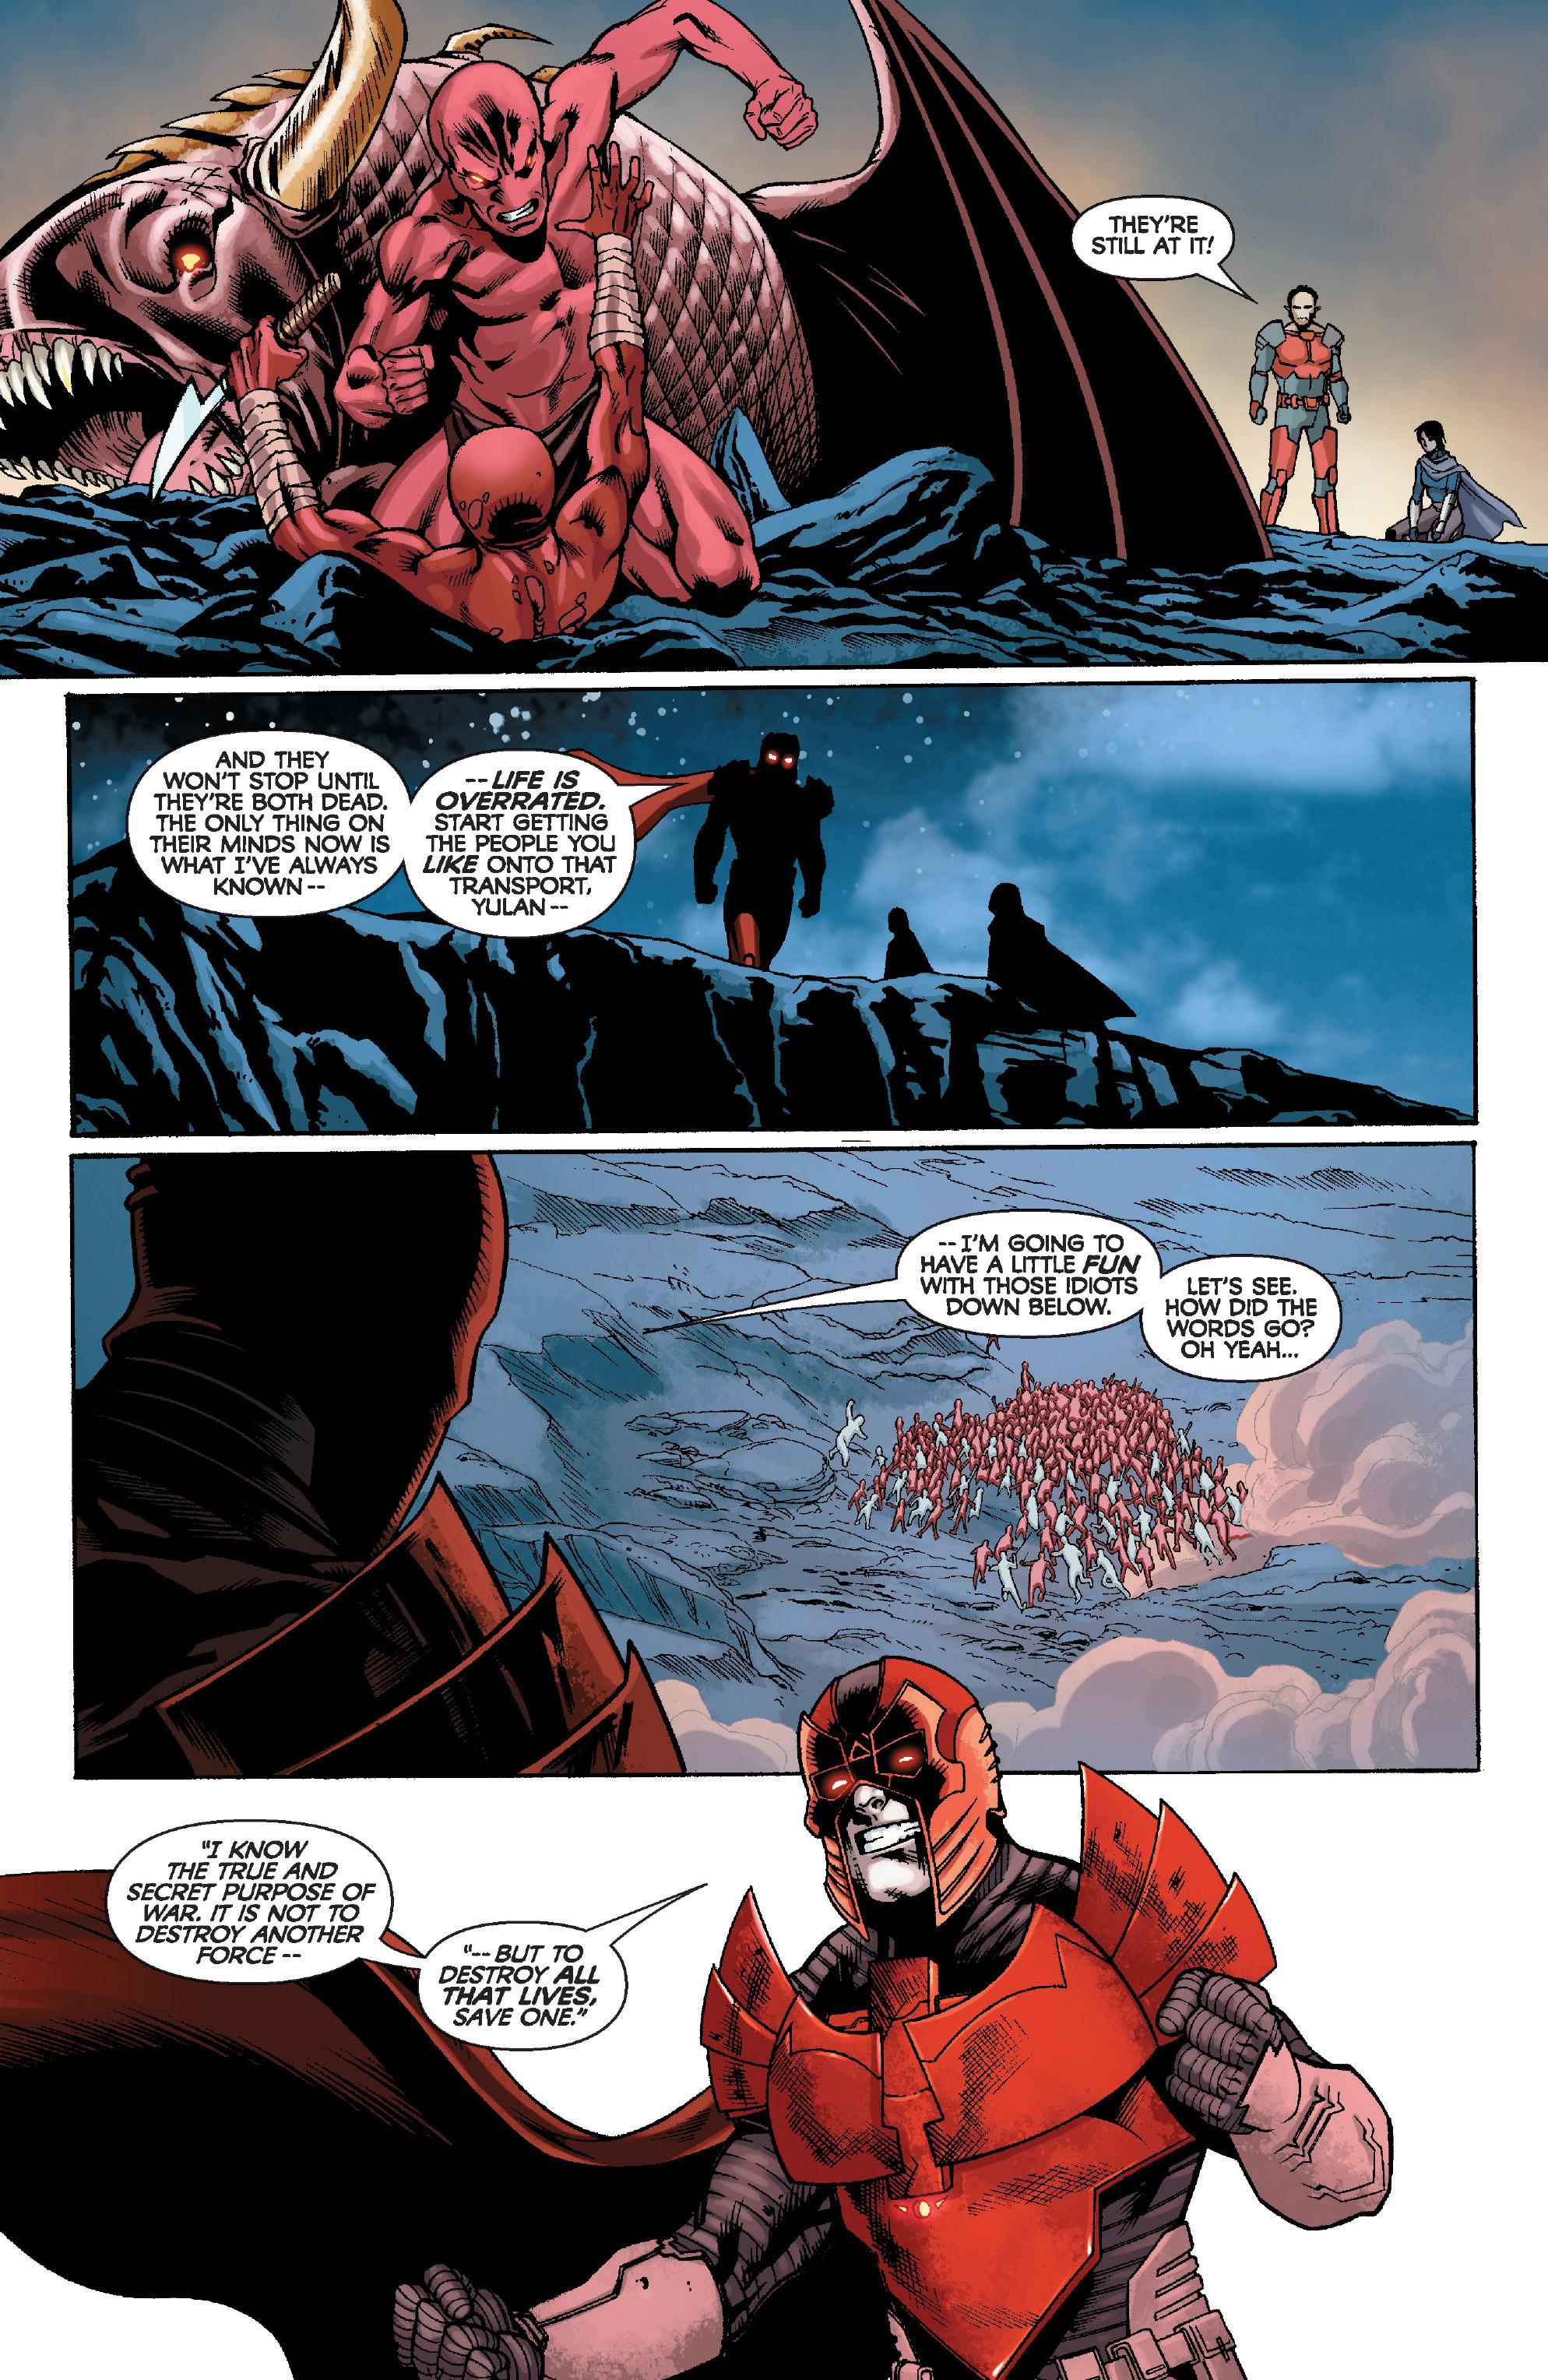 Read online Star Wars: Knight Errant - Escape comic -  Issue #4 - 11